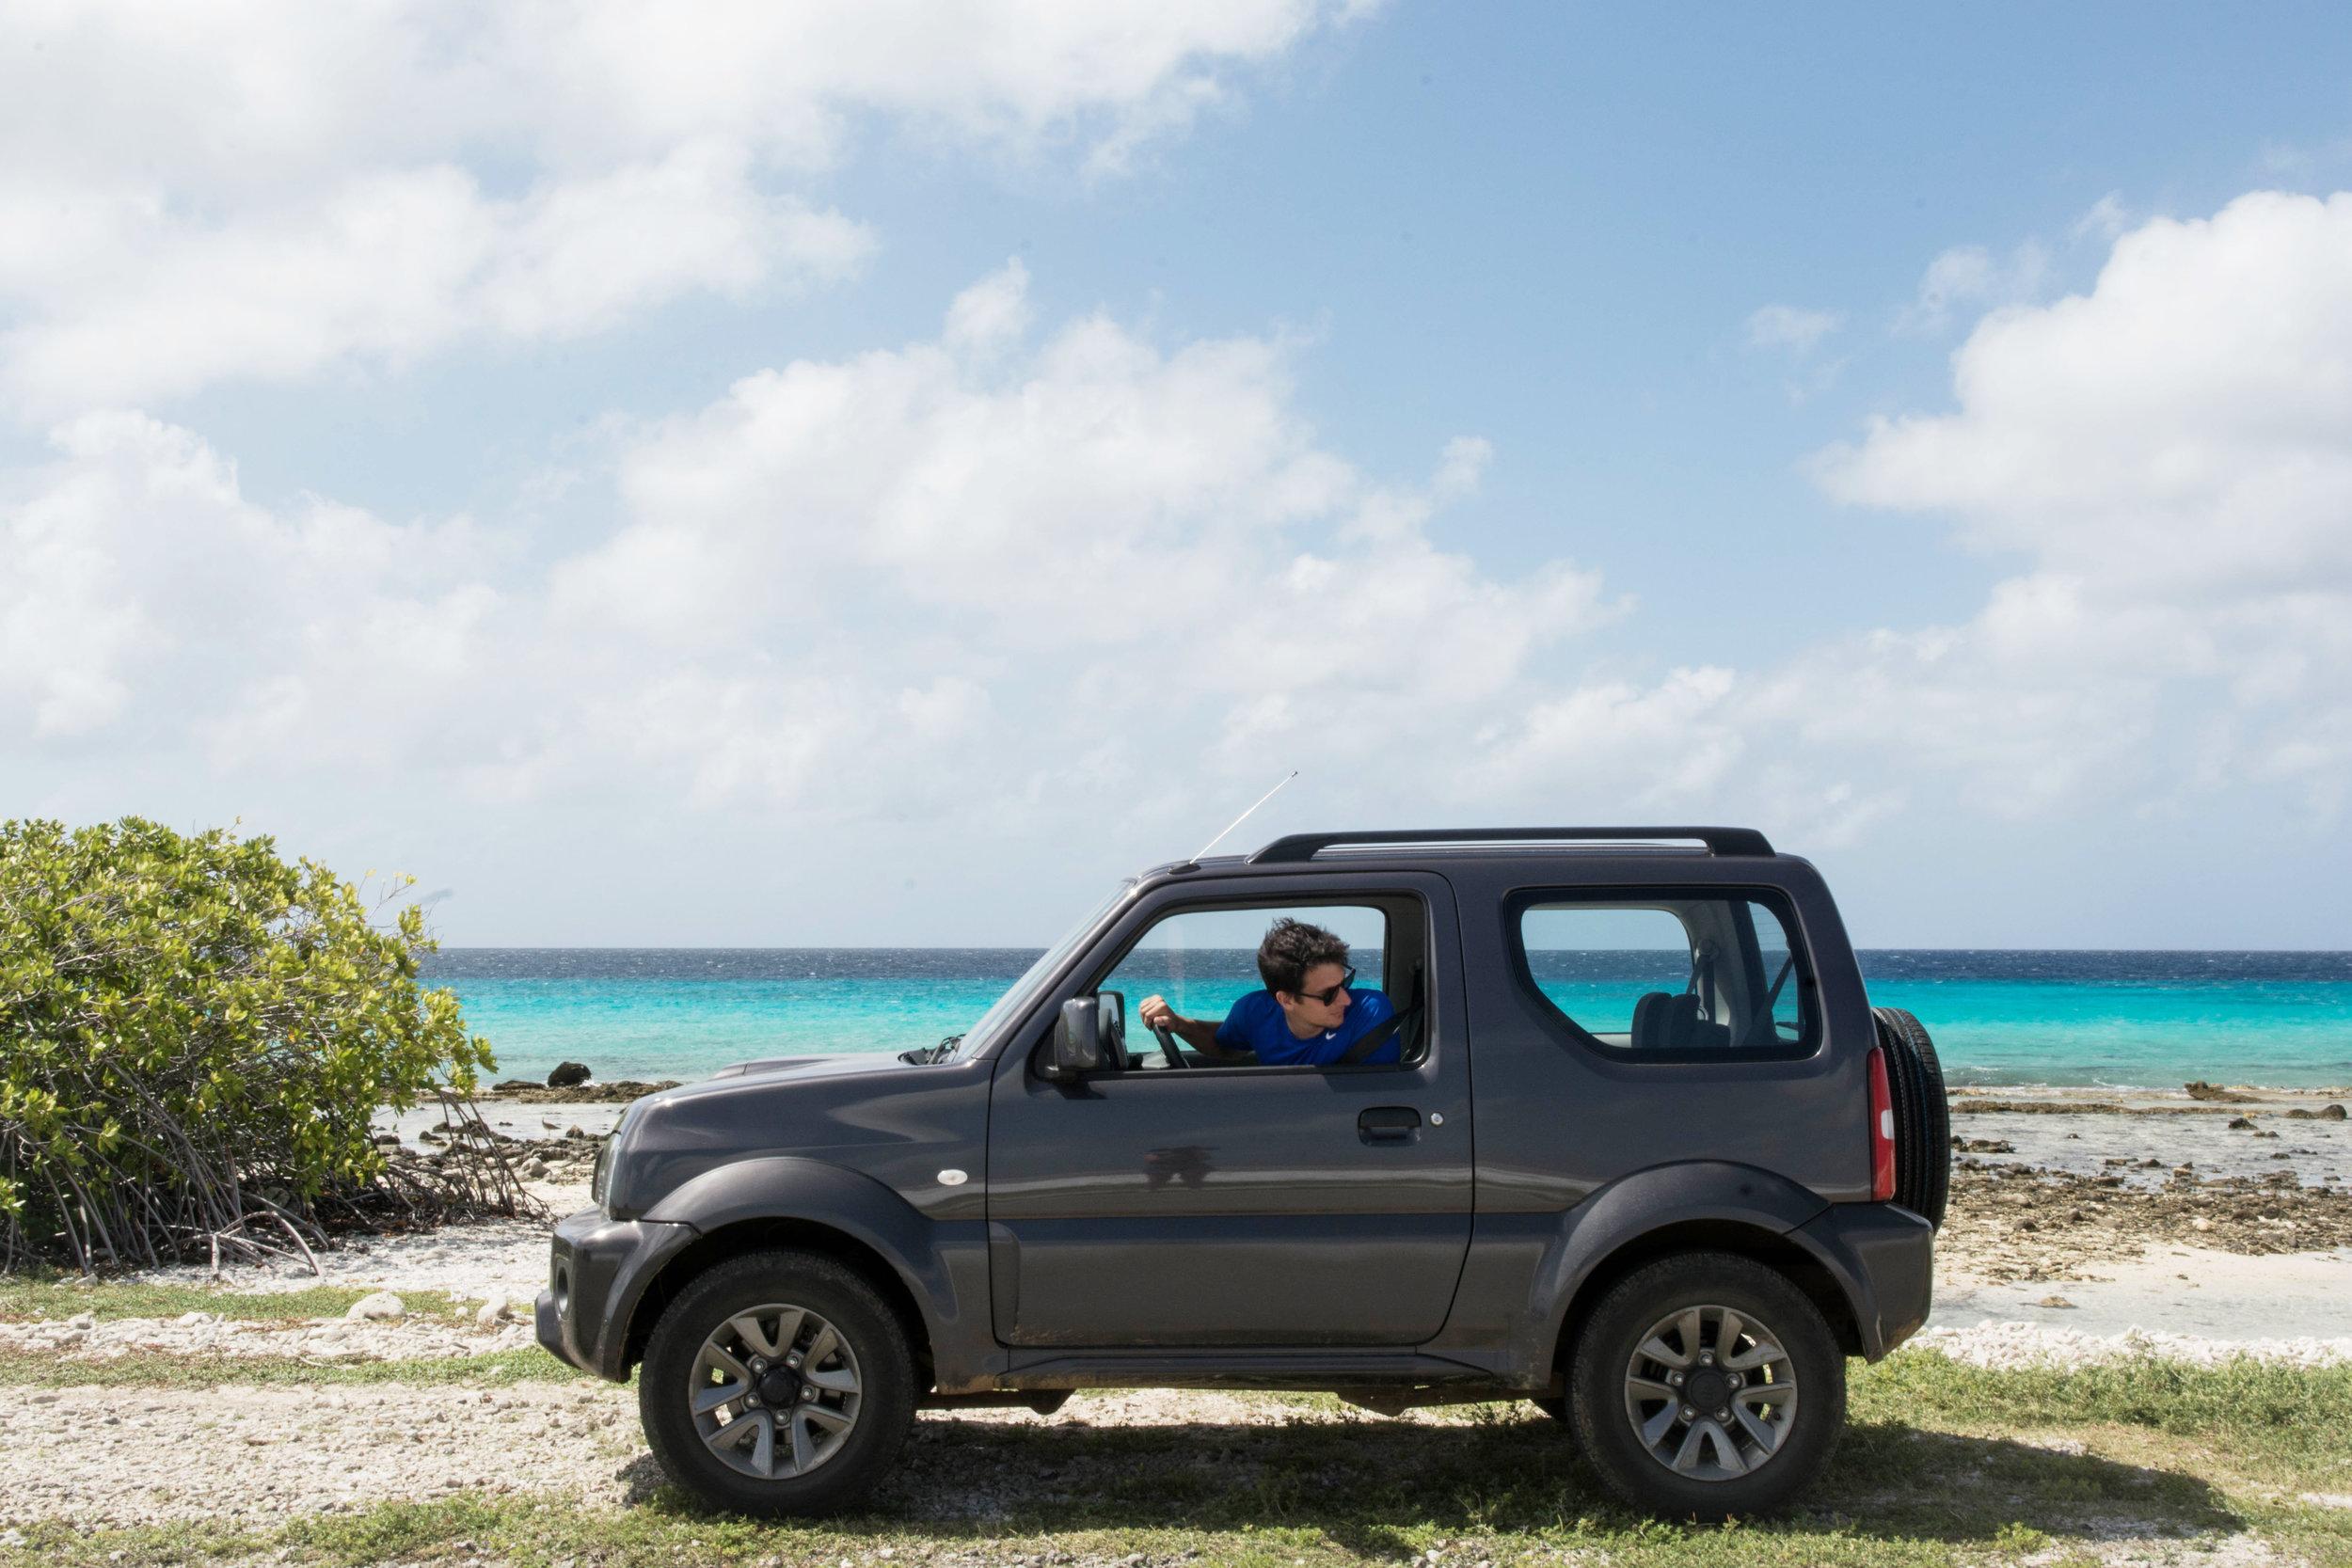 Driving on Bonaire